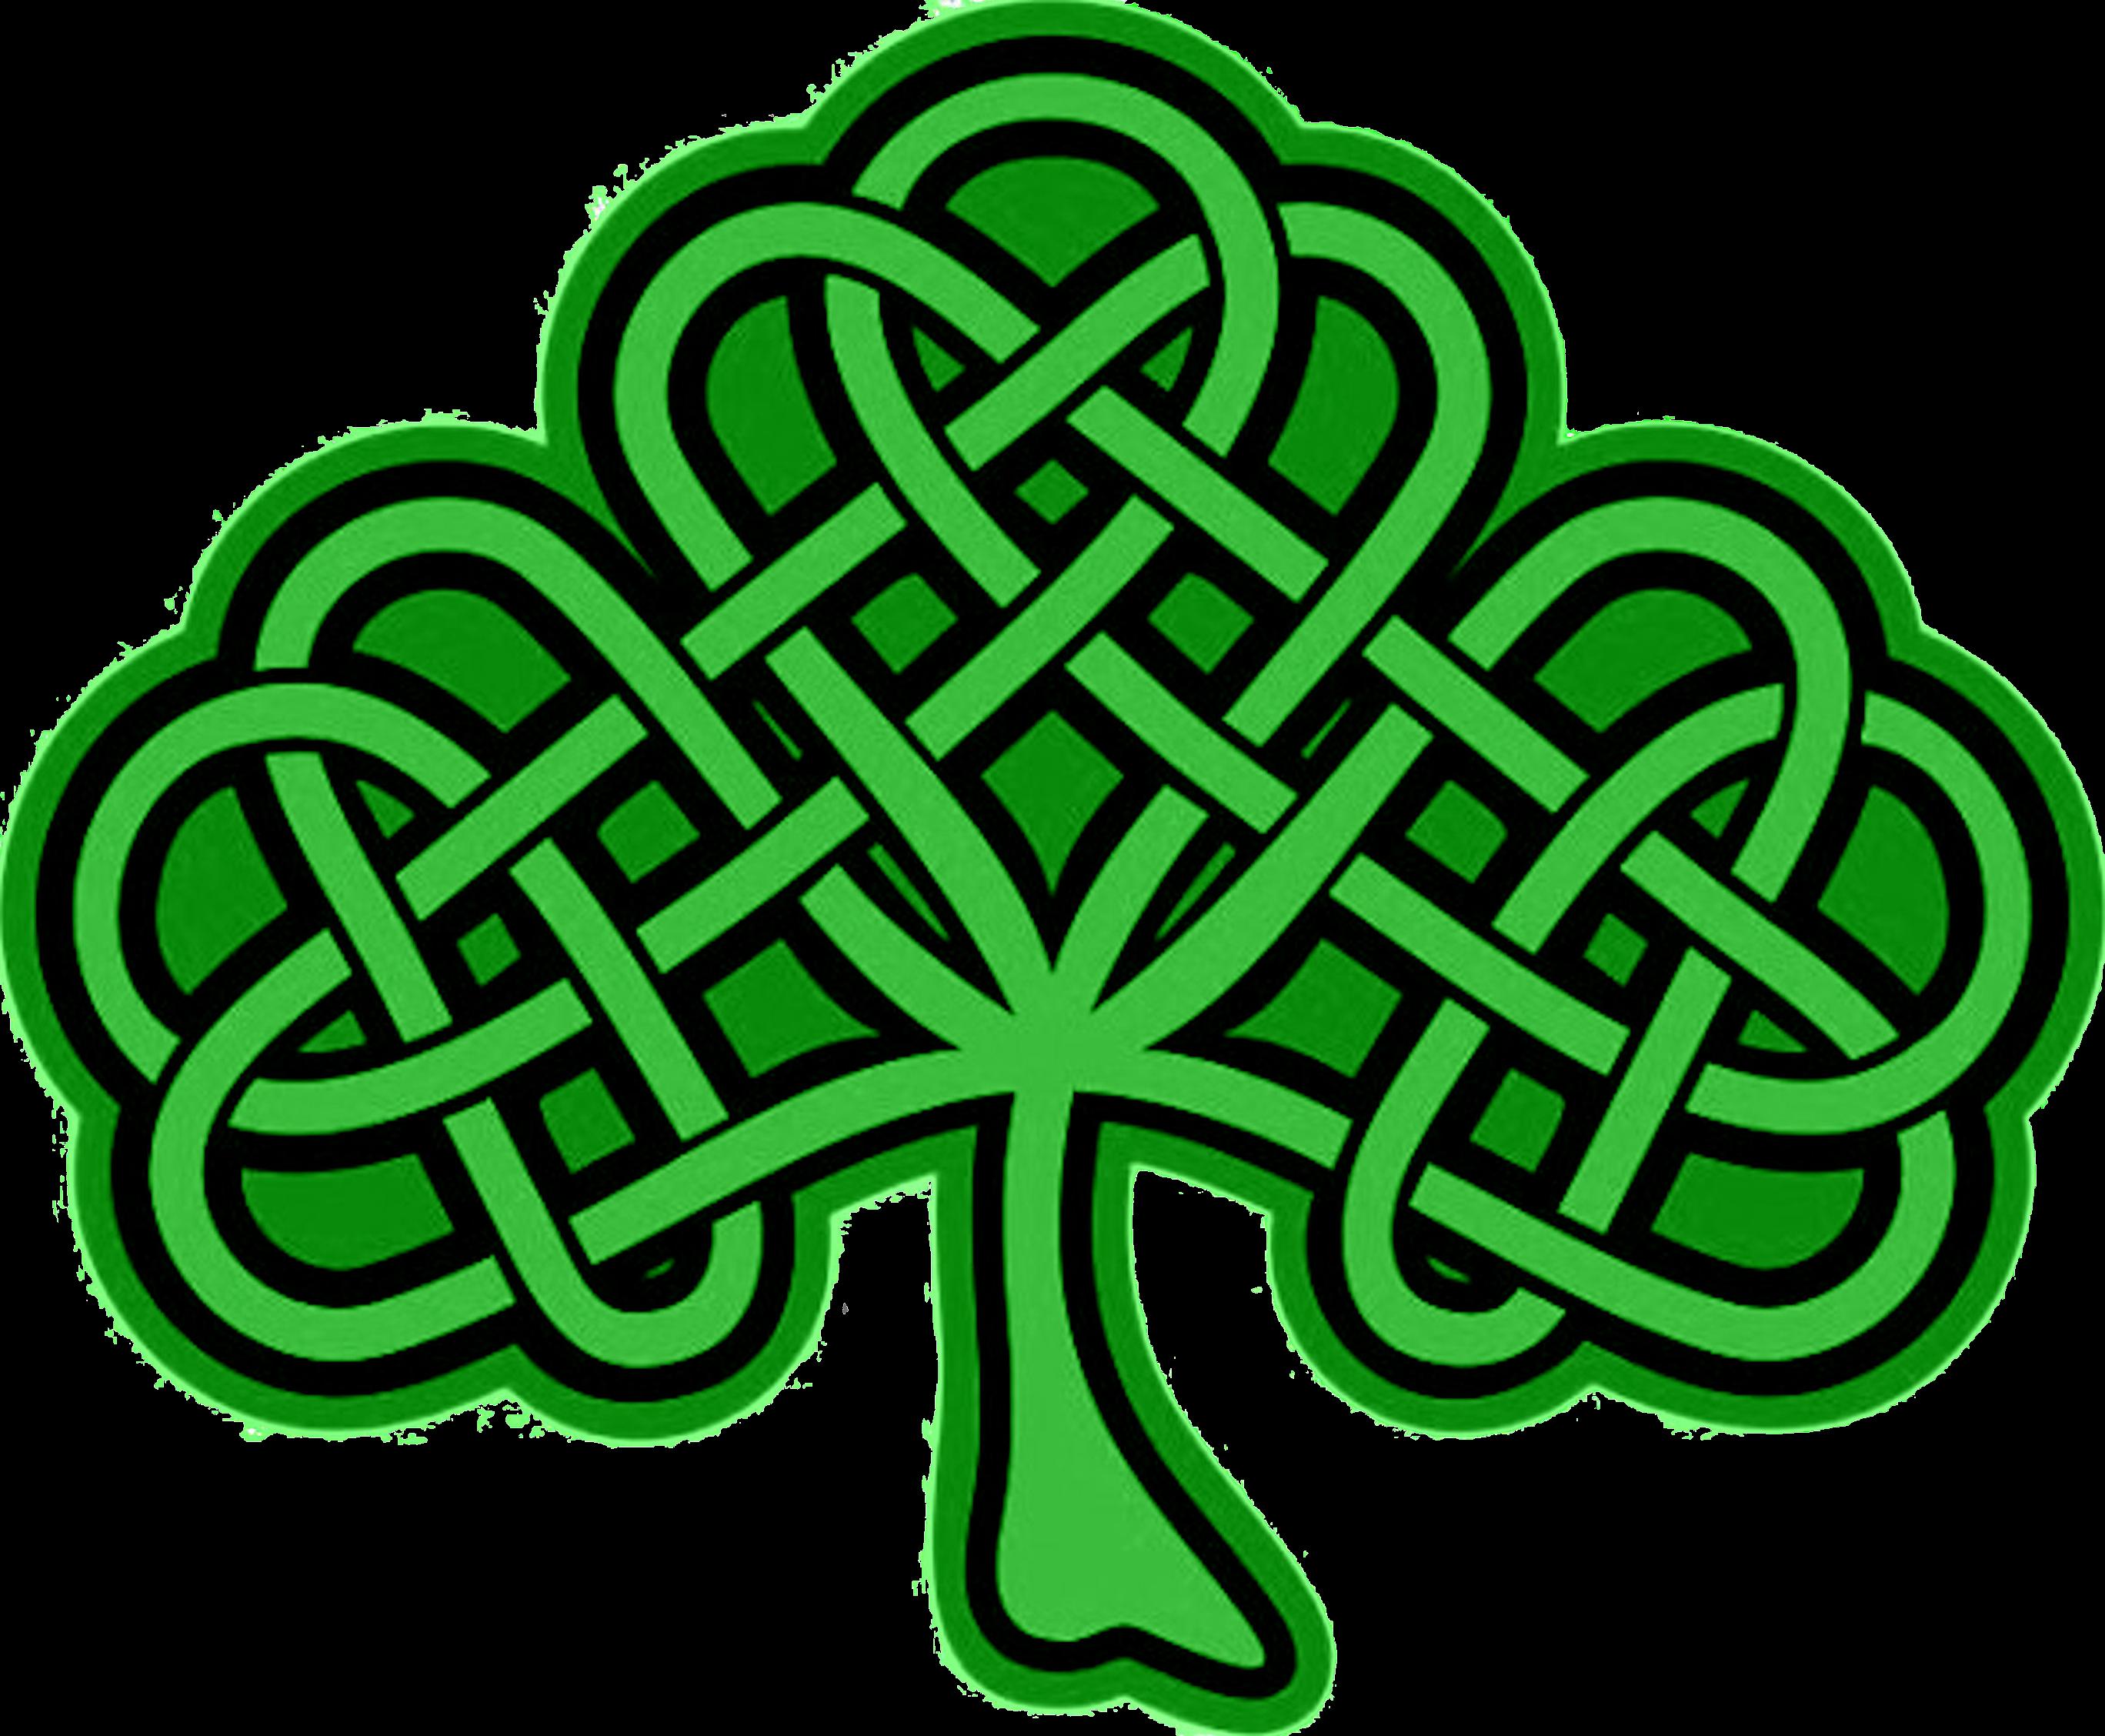 Celtic Knot clipart shamrock Knot clipart shamrock shamrock Celtic